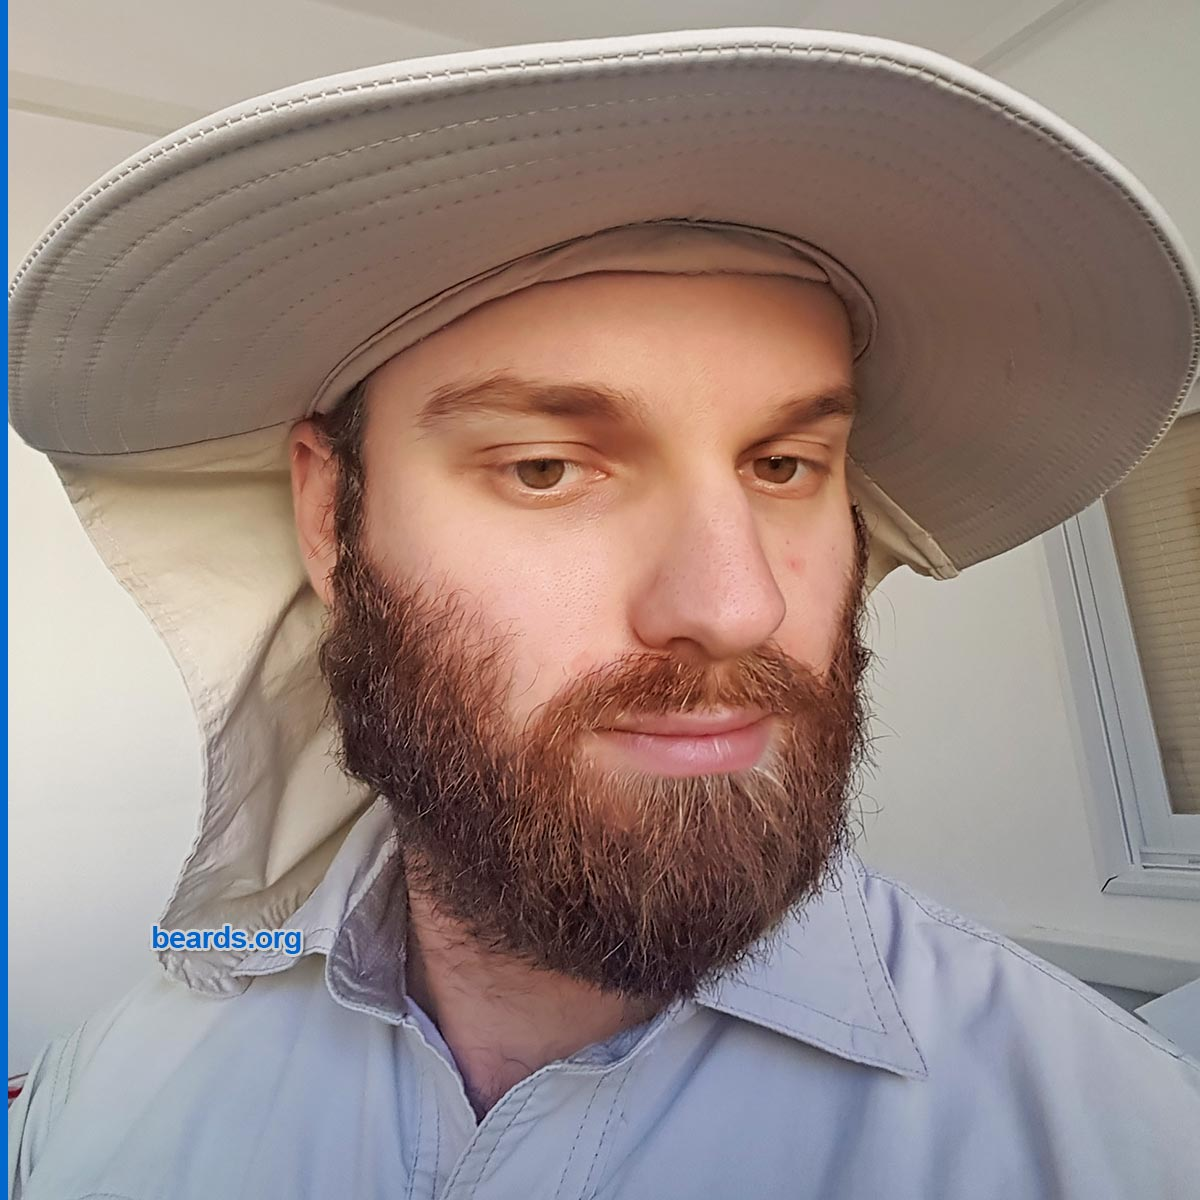 Michael's beard on 2019/01/30, image 2